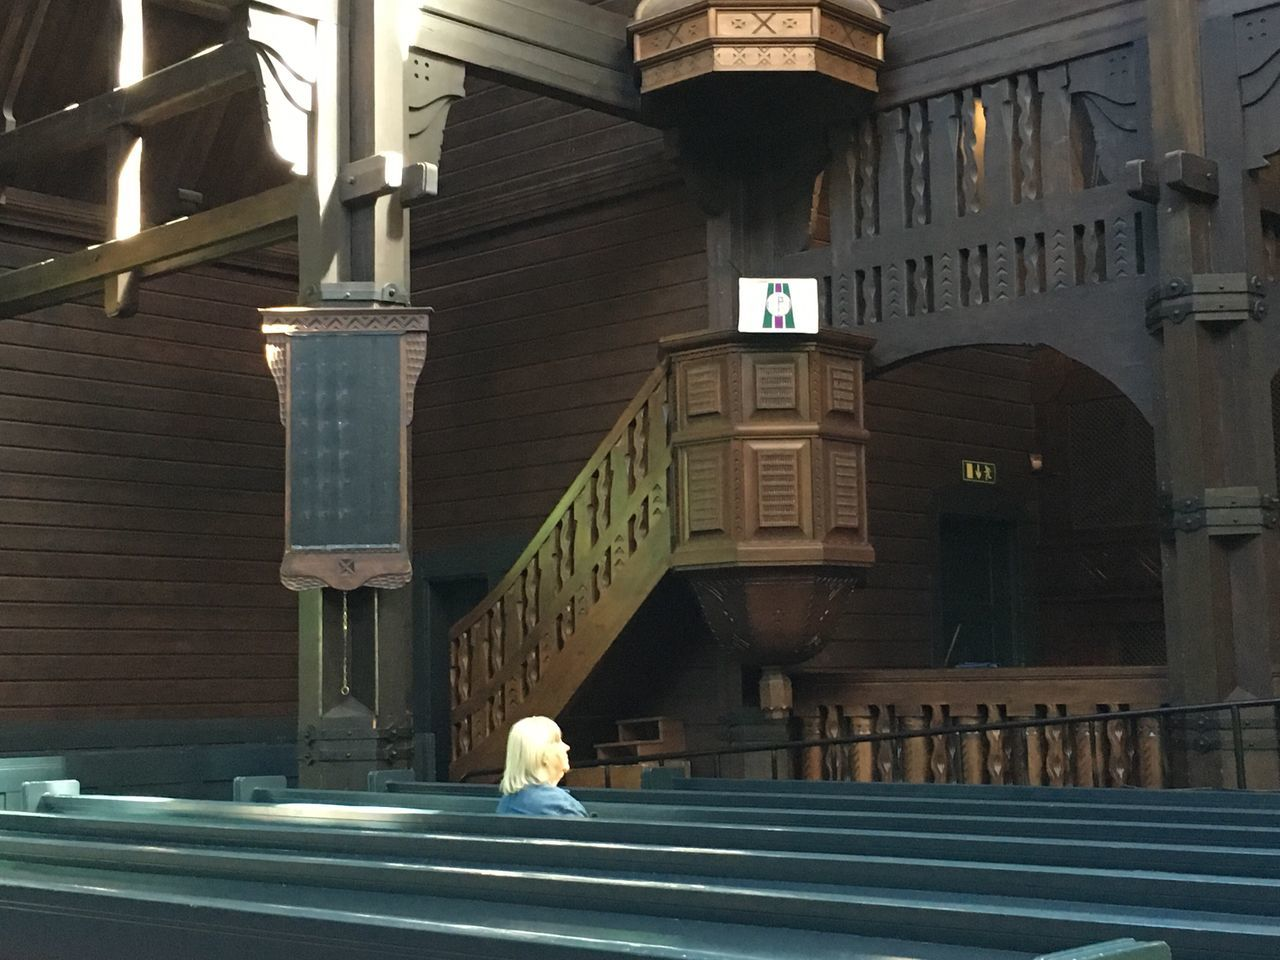 Church Woman New Film Sweden Lappland Making Art Northen Polar Circle Kiruna Sapmi Liselotte Wajstedt Calm Quiet ©Liselottewajstedt Making A New Movie Kiruna Ortdrivaren Kiruna The Drift Block Moving City